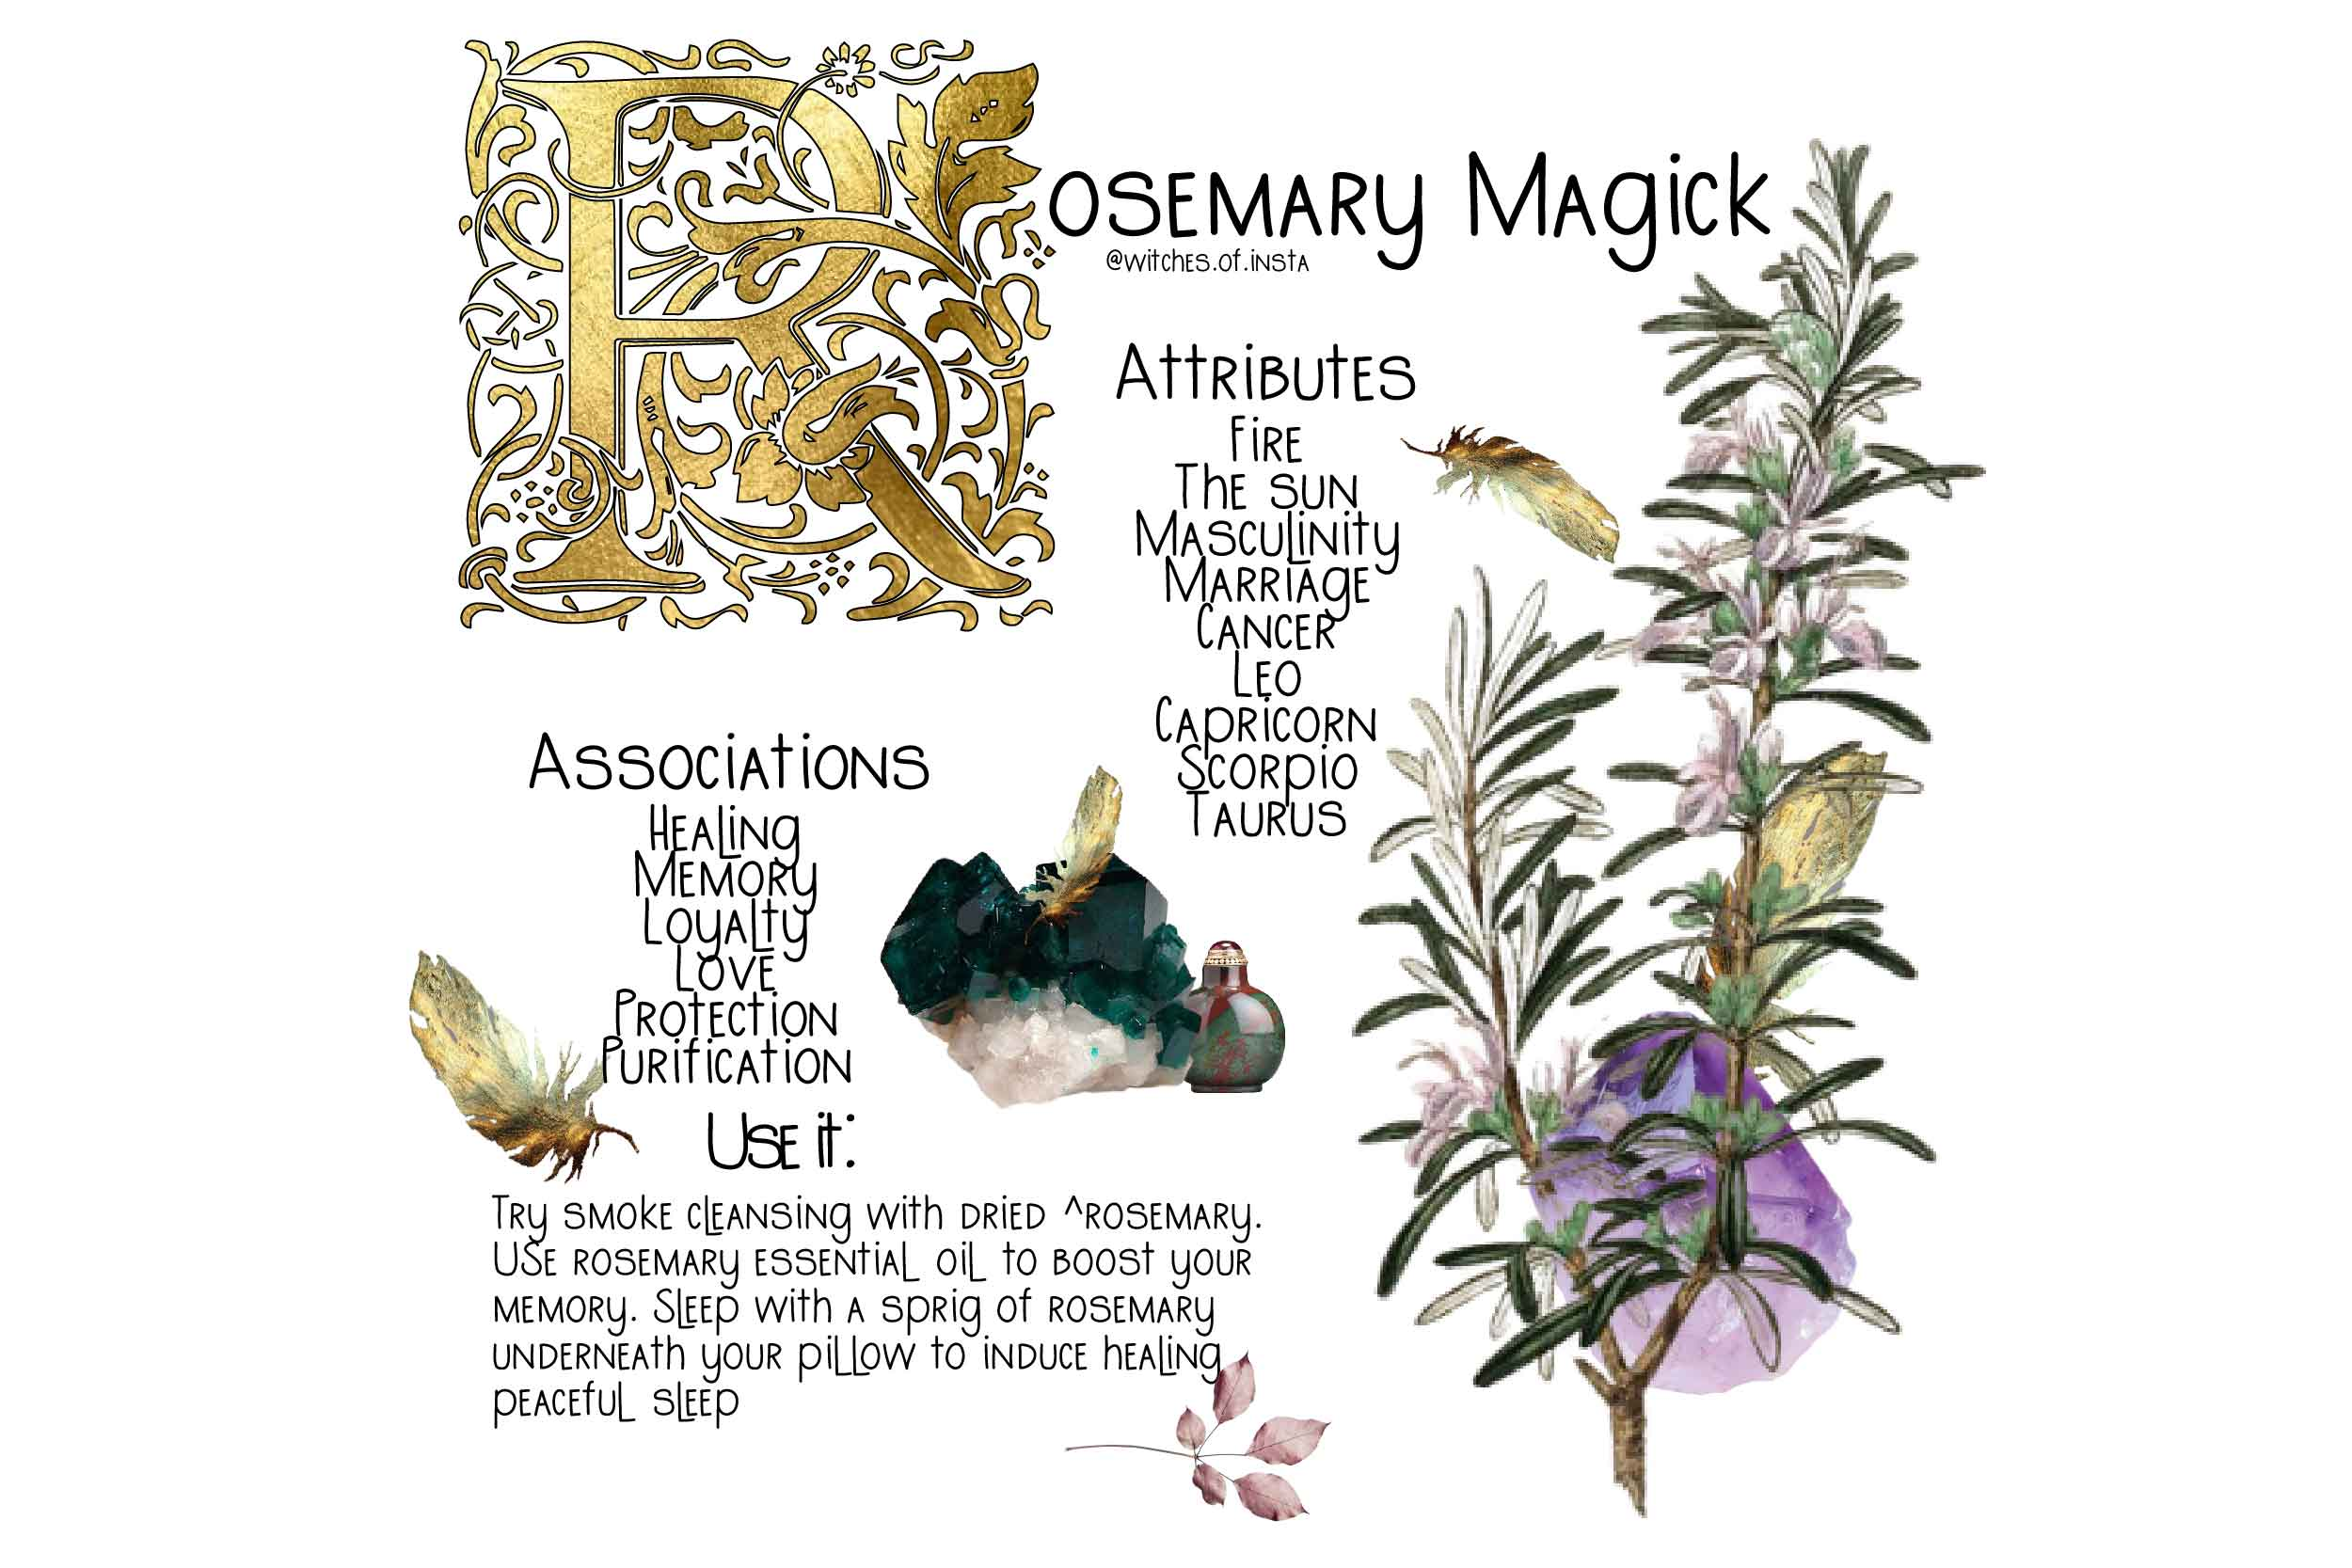 rosemary magick